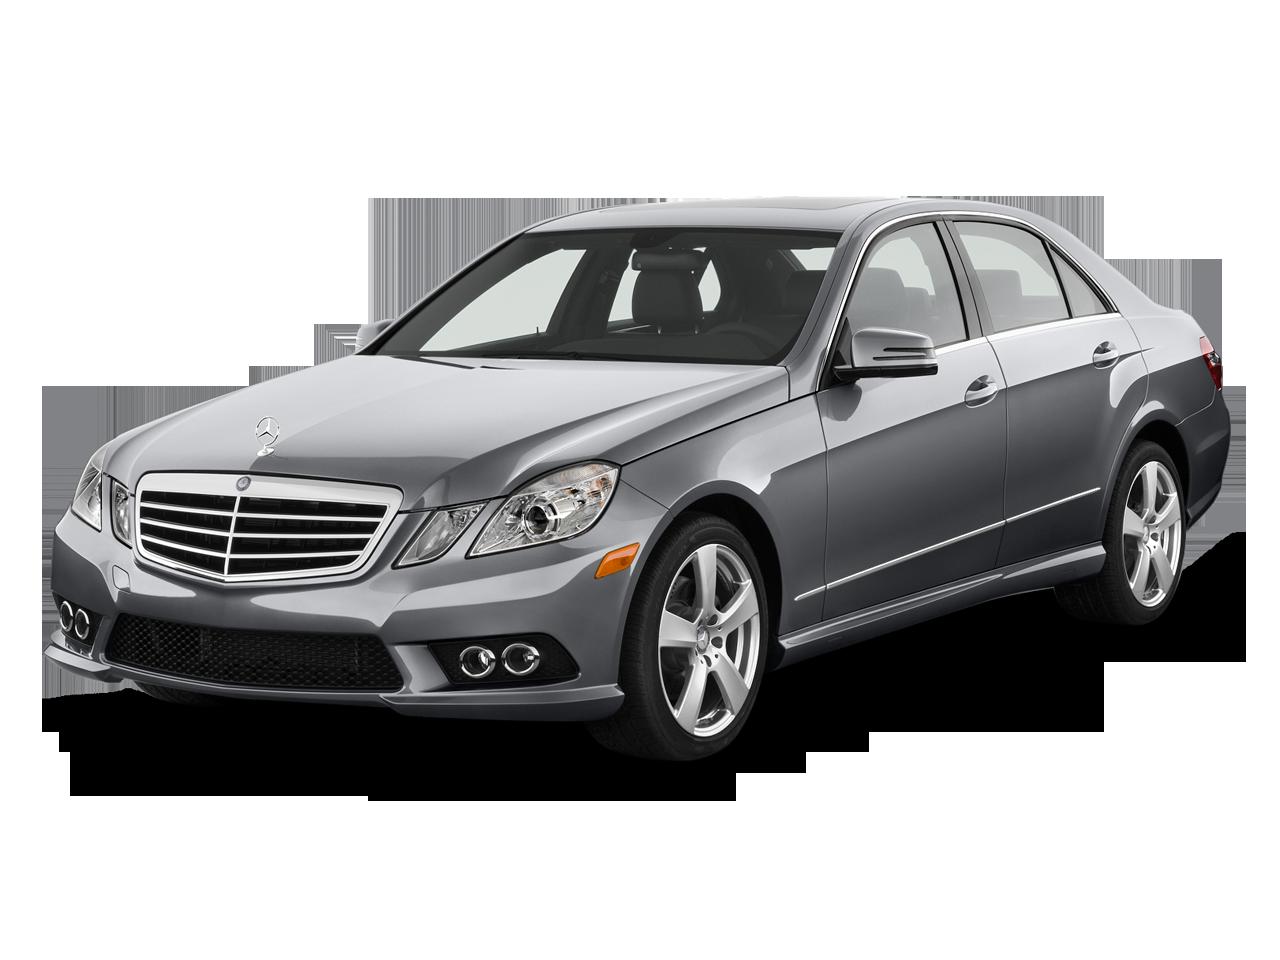 https://st.automobilemag.com/uploads/sites/10/2015/11/2012-mercedes-benz-e-class-350-sport-sedan-angular-front.png